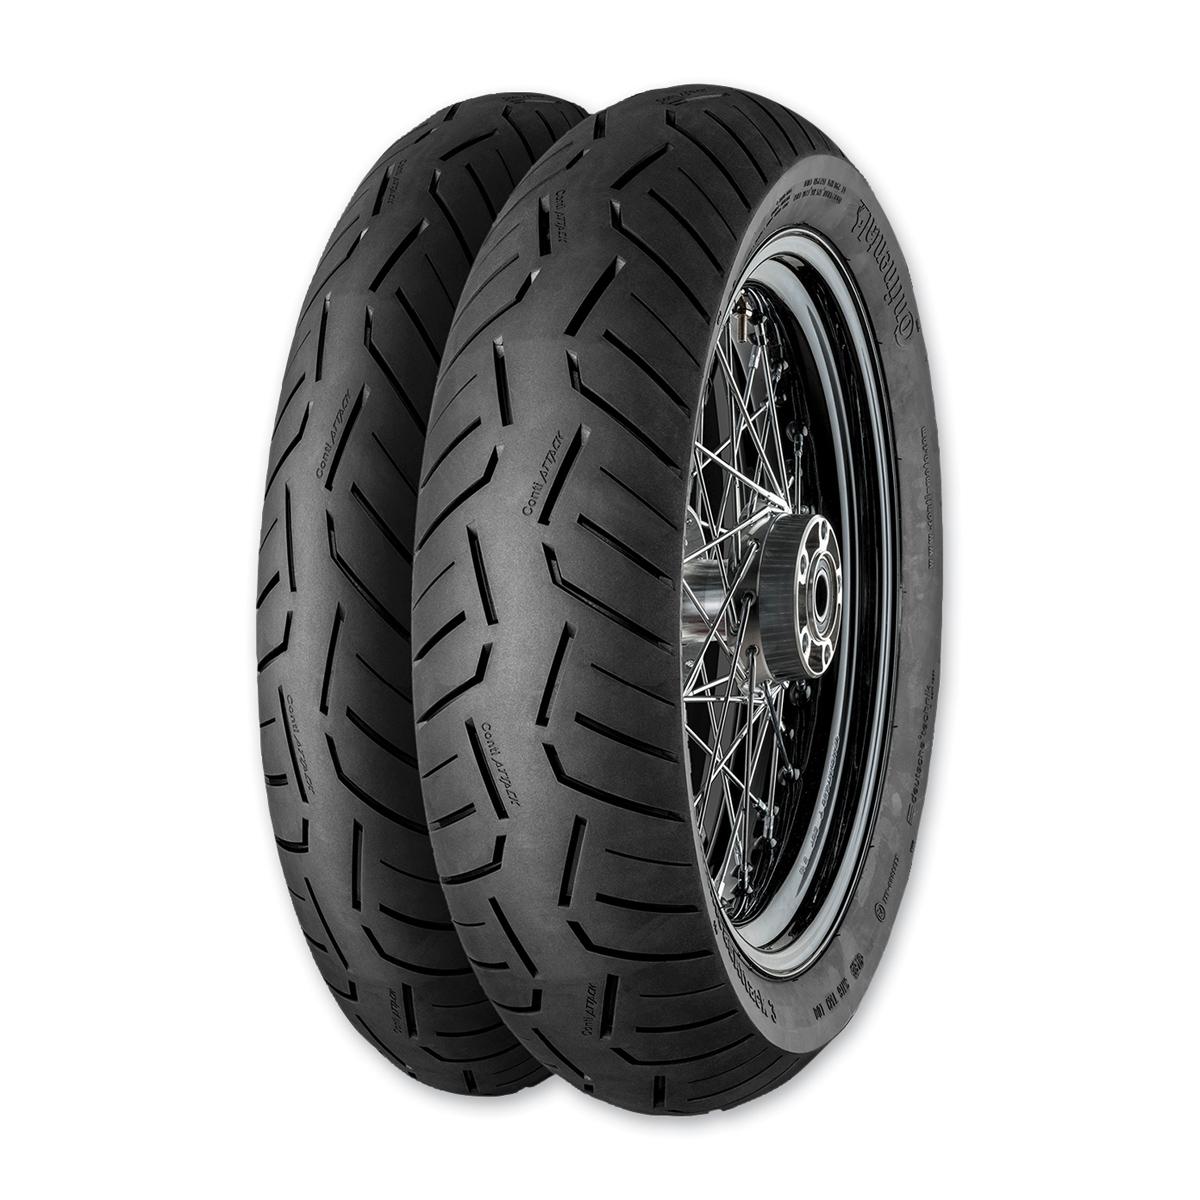 Continental Road Attack 3 150/70R17 Rear Tire